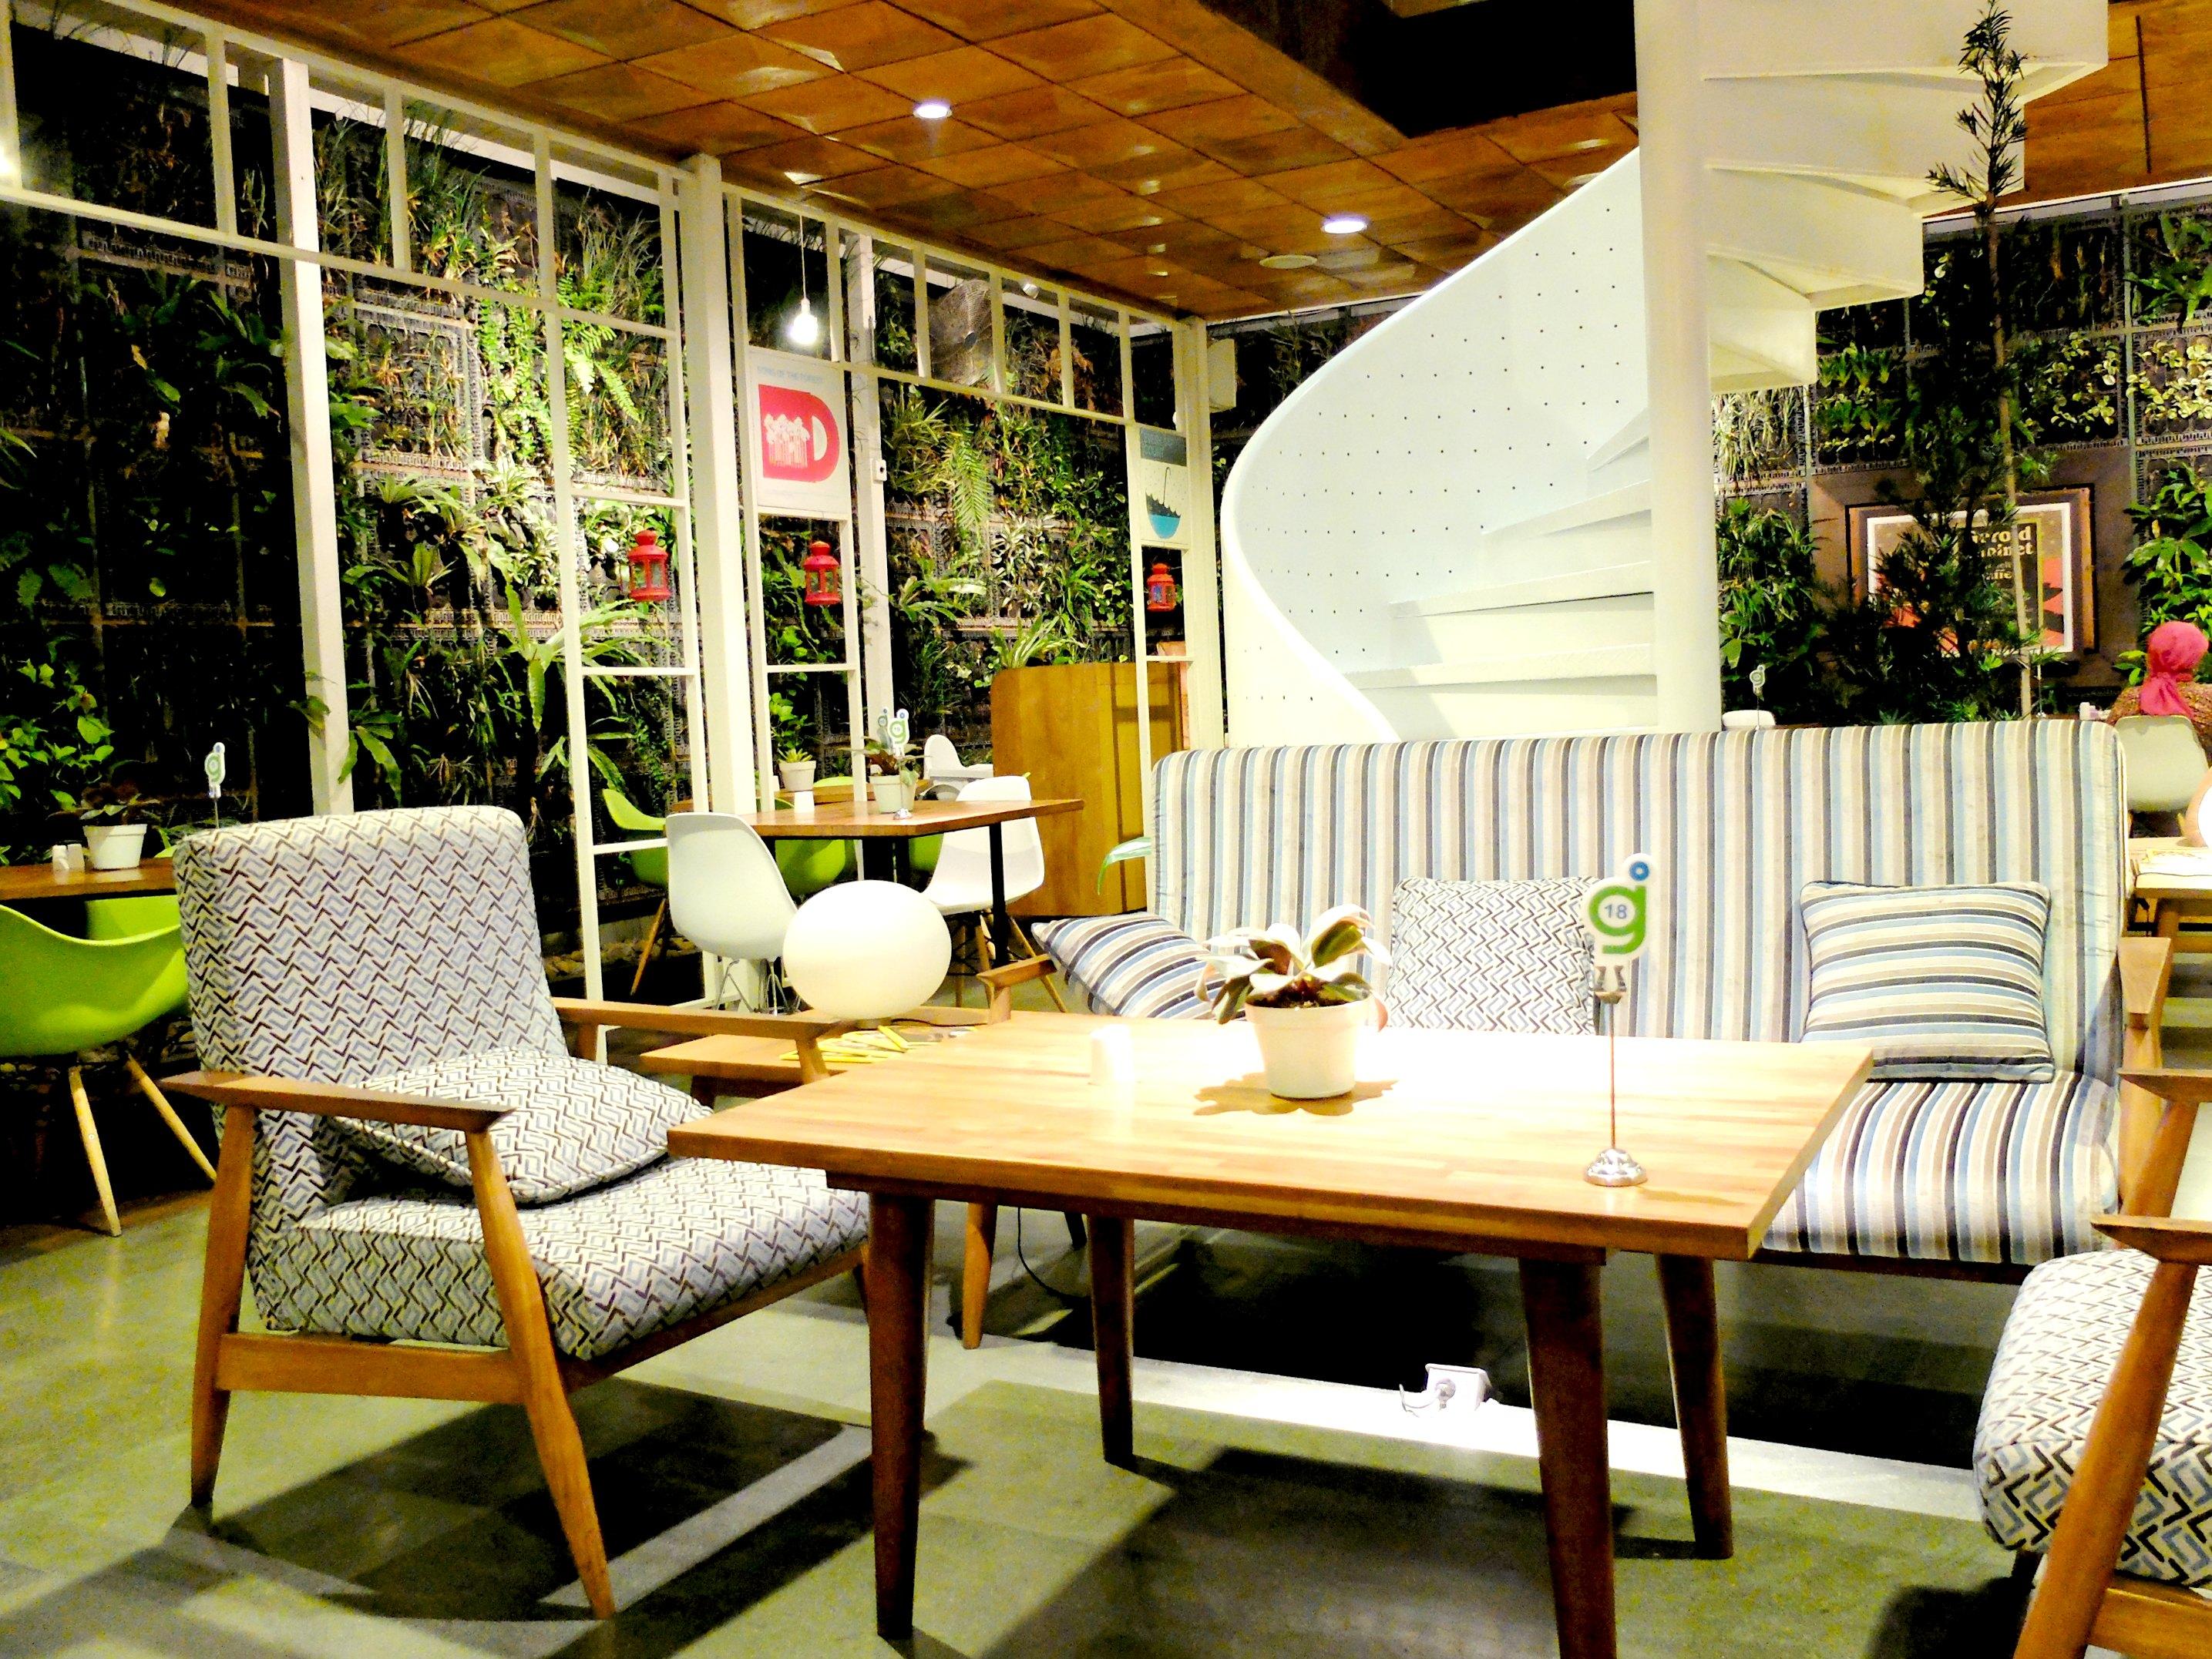 Origin house and kitchen interior